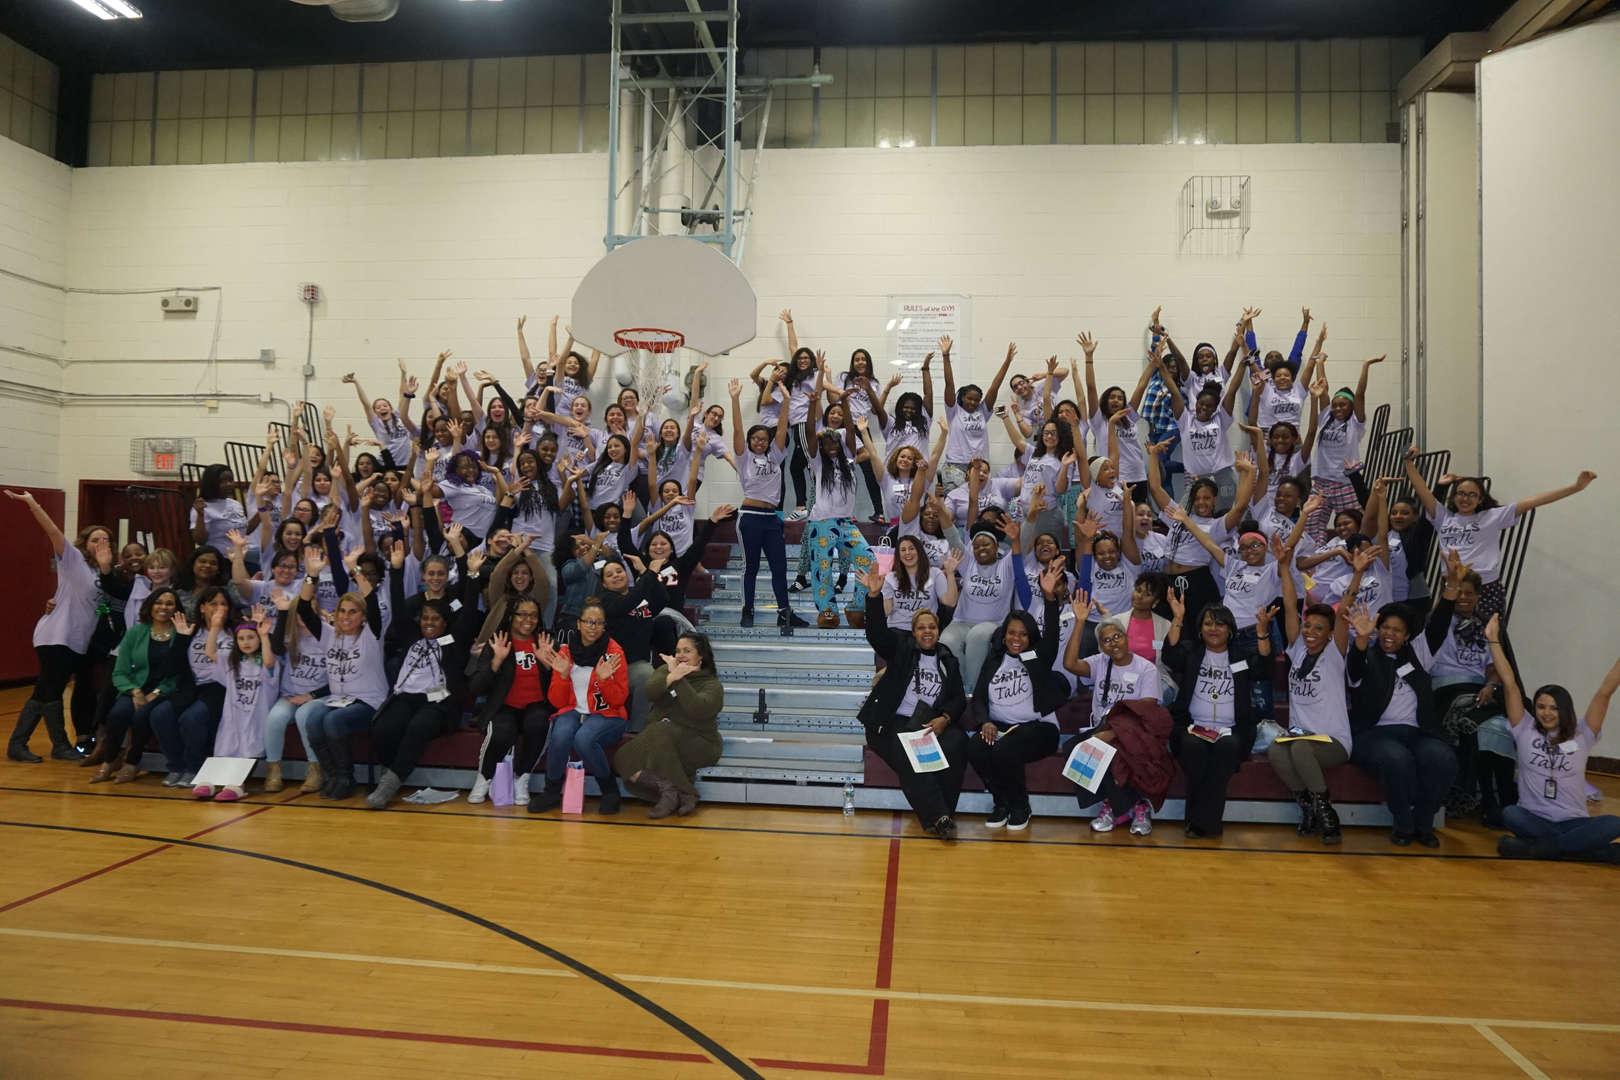 JDMS teachers cheering